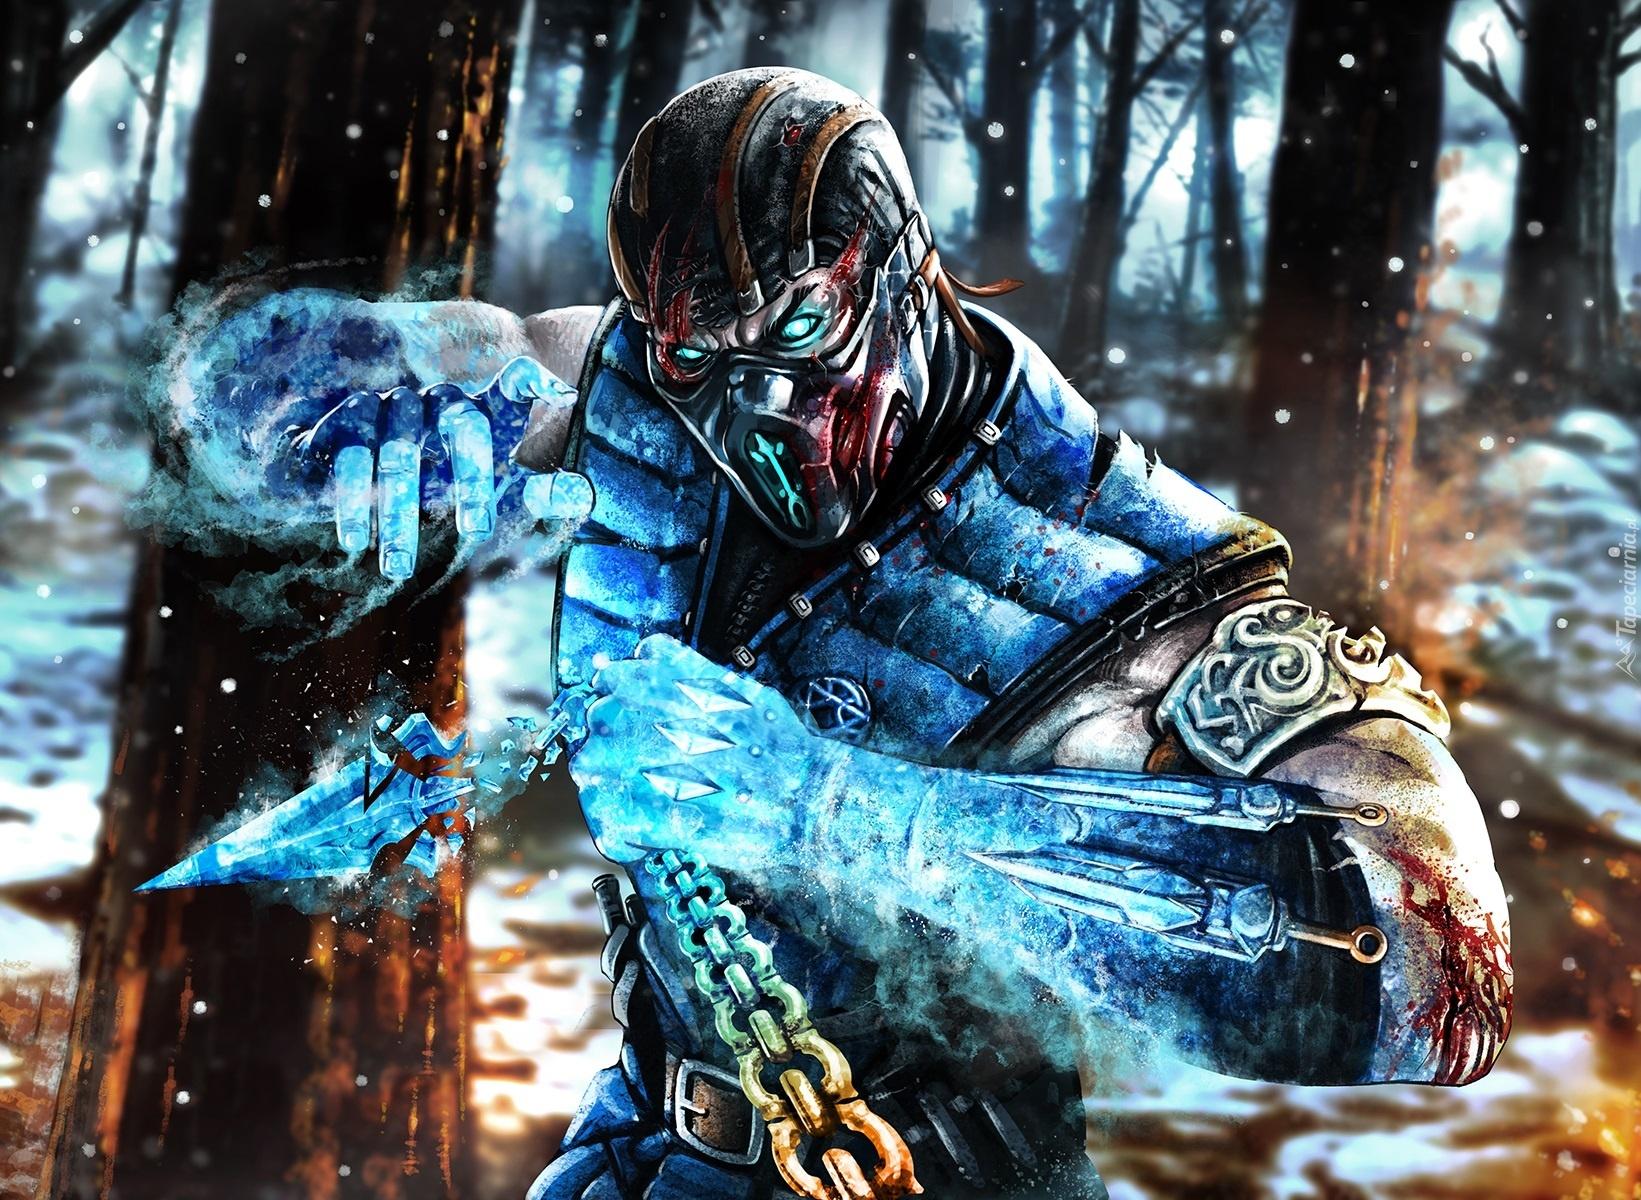 Mortal Kombat X Wallpaper, HD Games 4K Wallpapers, Images